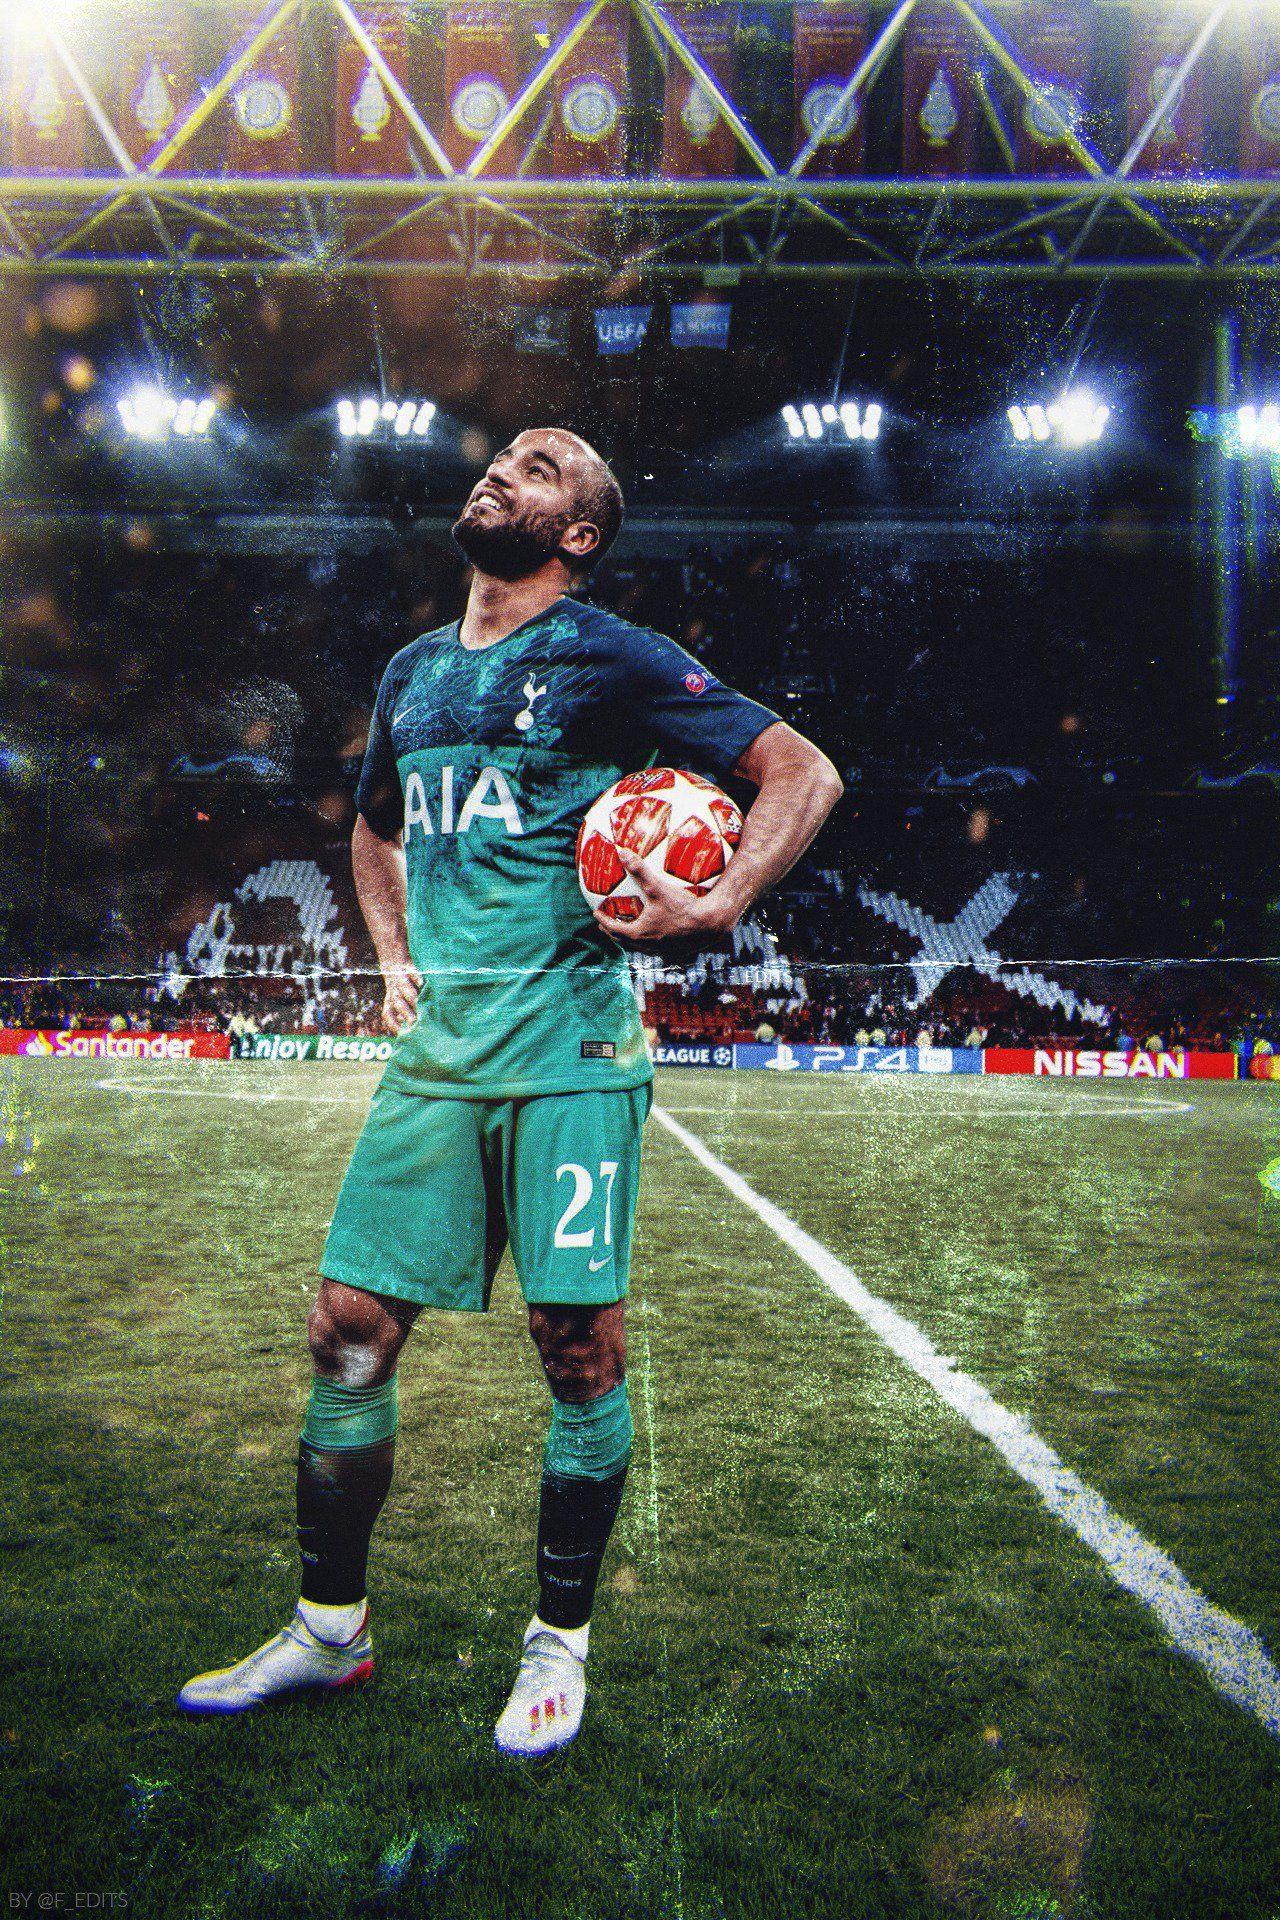 Fredrik On Twitter Tottenham Hotspur Wallpaper Tottenham Football Tottenham Hotspur Football